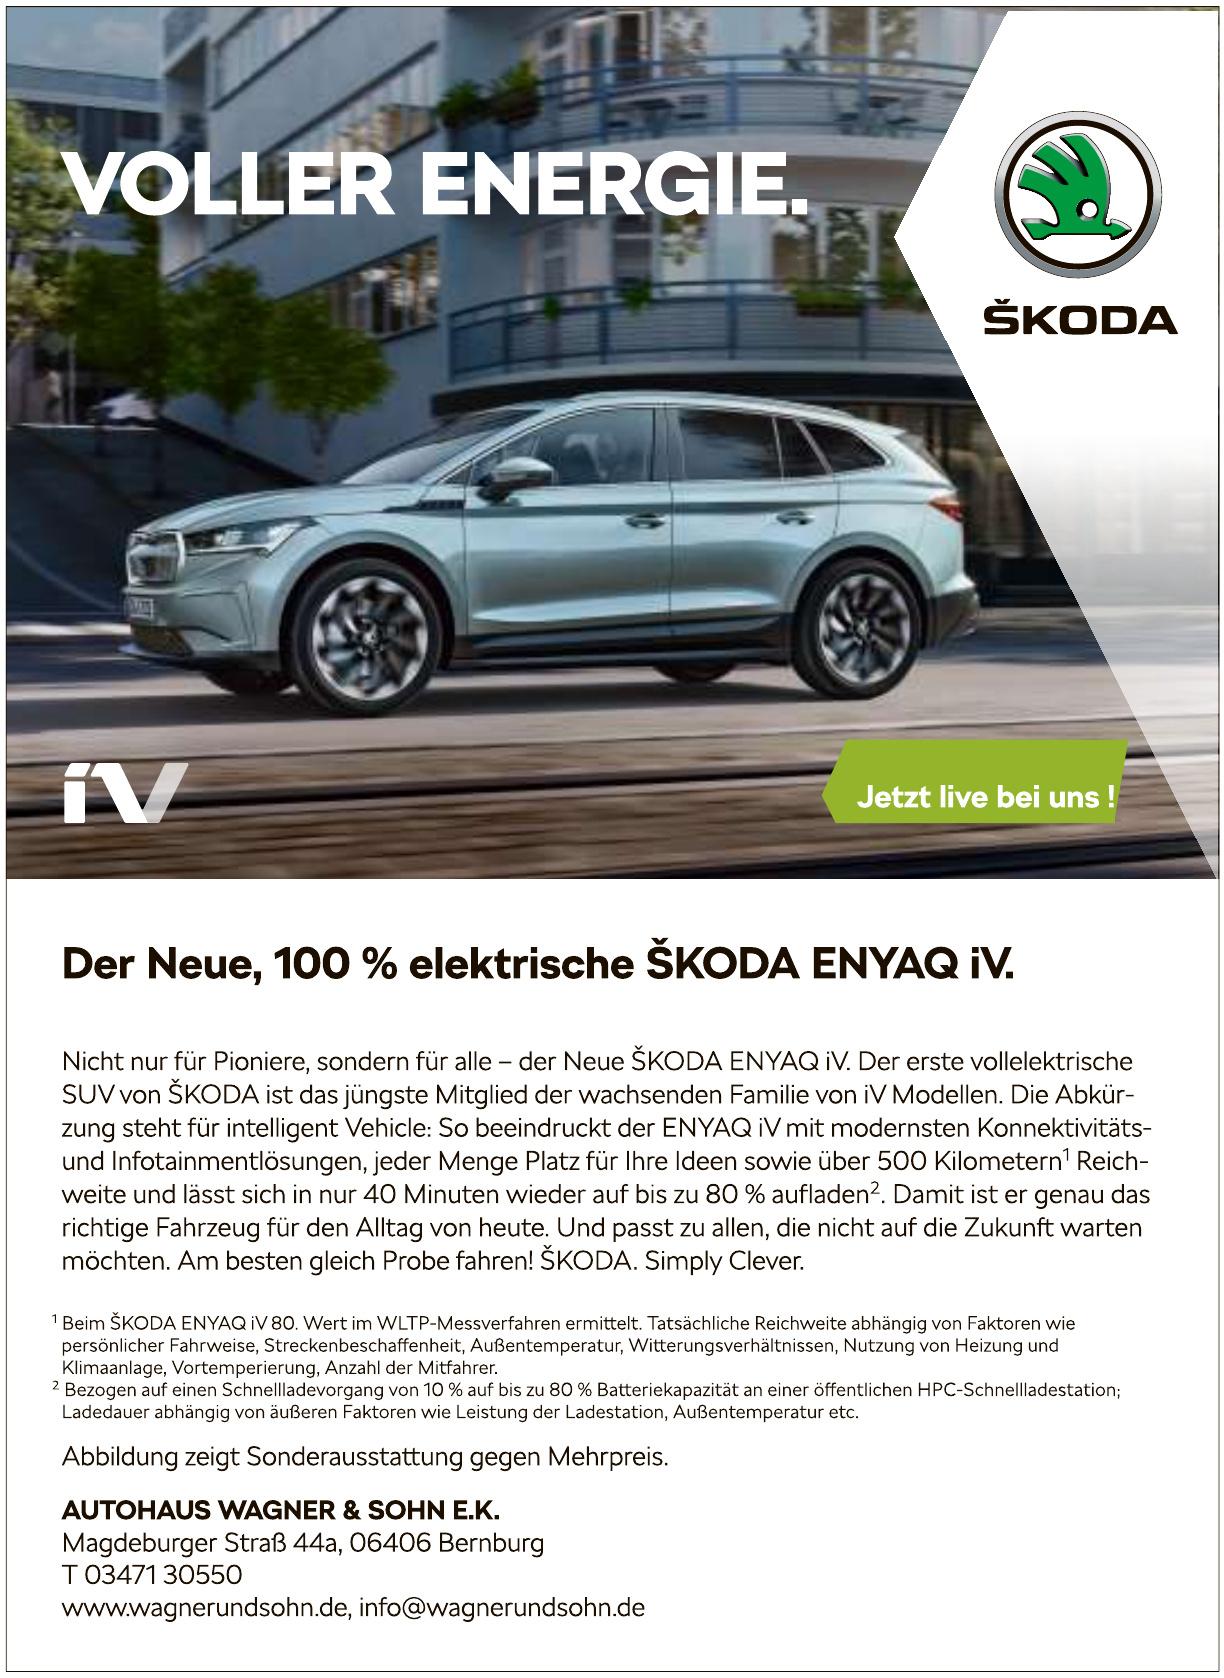 Autohaus Wagner & Sohn e.K.